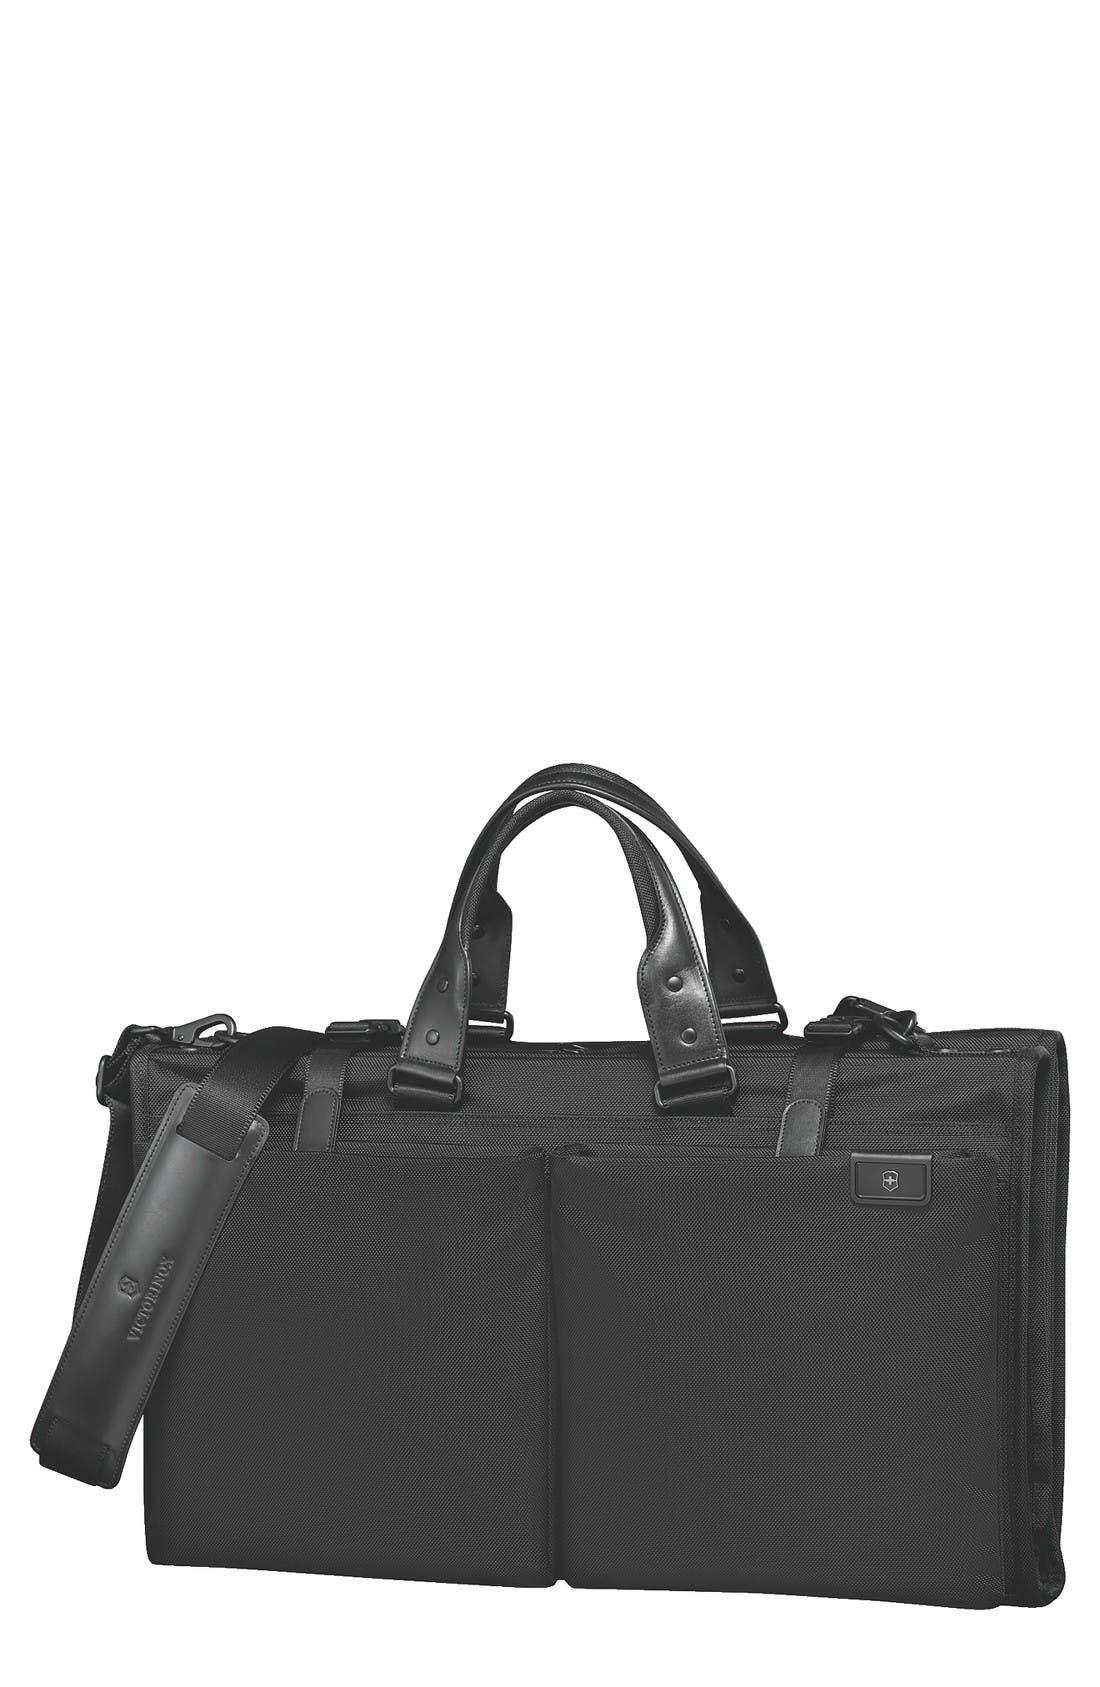 VICTORINOX SWISS ARMY<SUP>®</SUP> Lexicon 2.0 Trifold Garment Bag